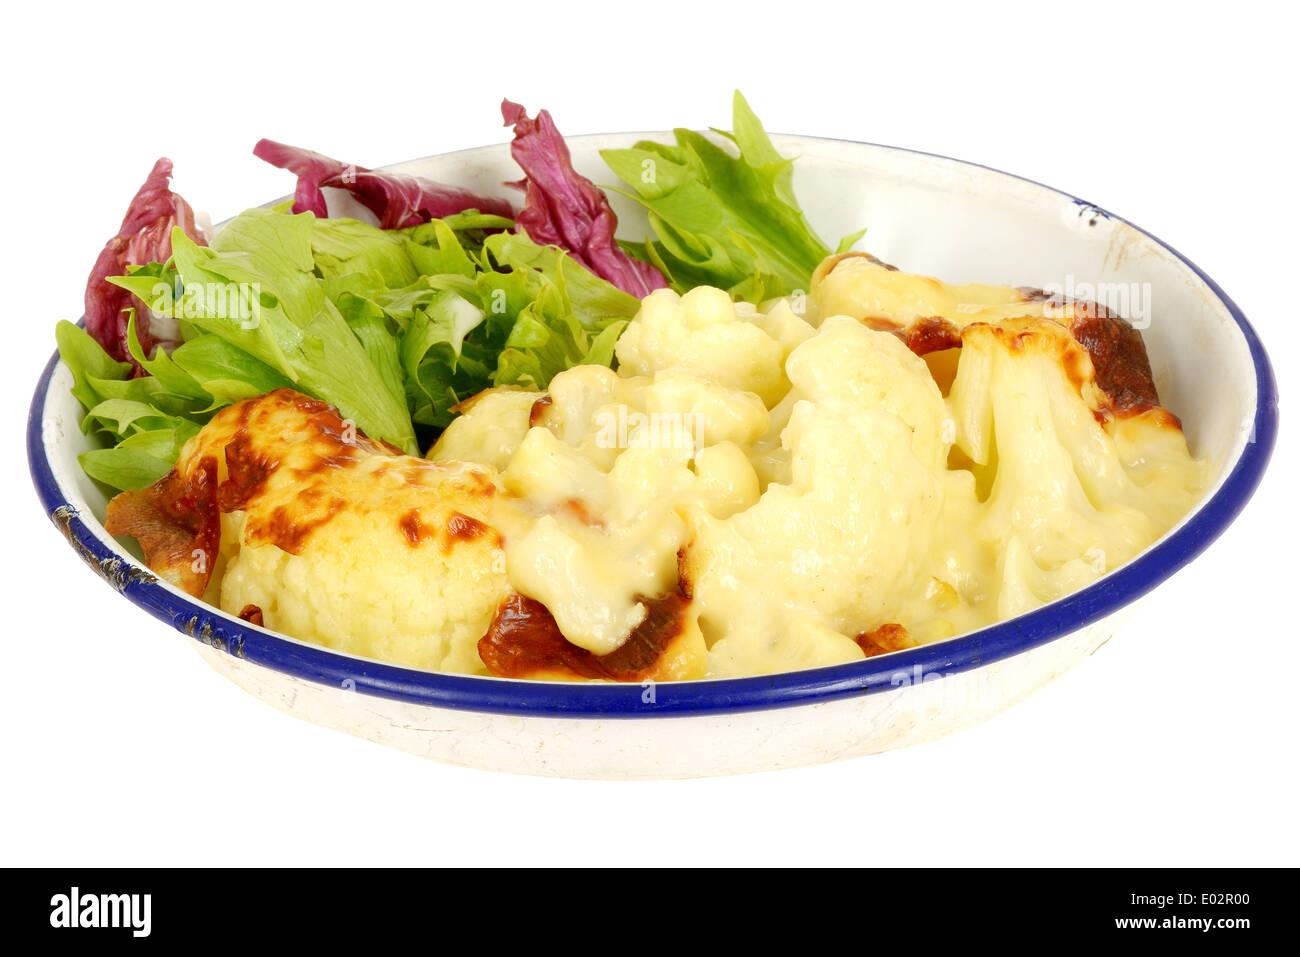 Cauliflower Cheese with Salad - Stock Image